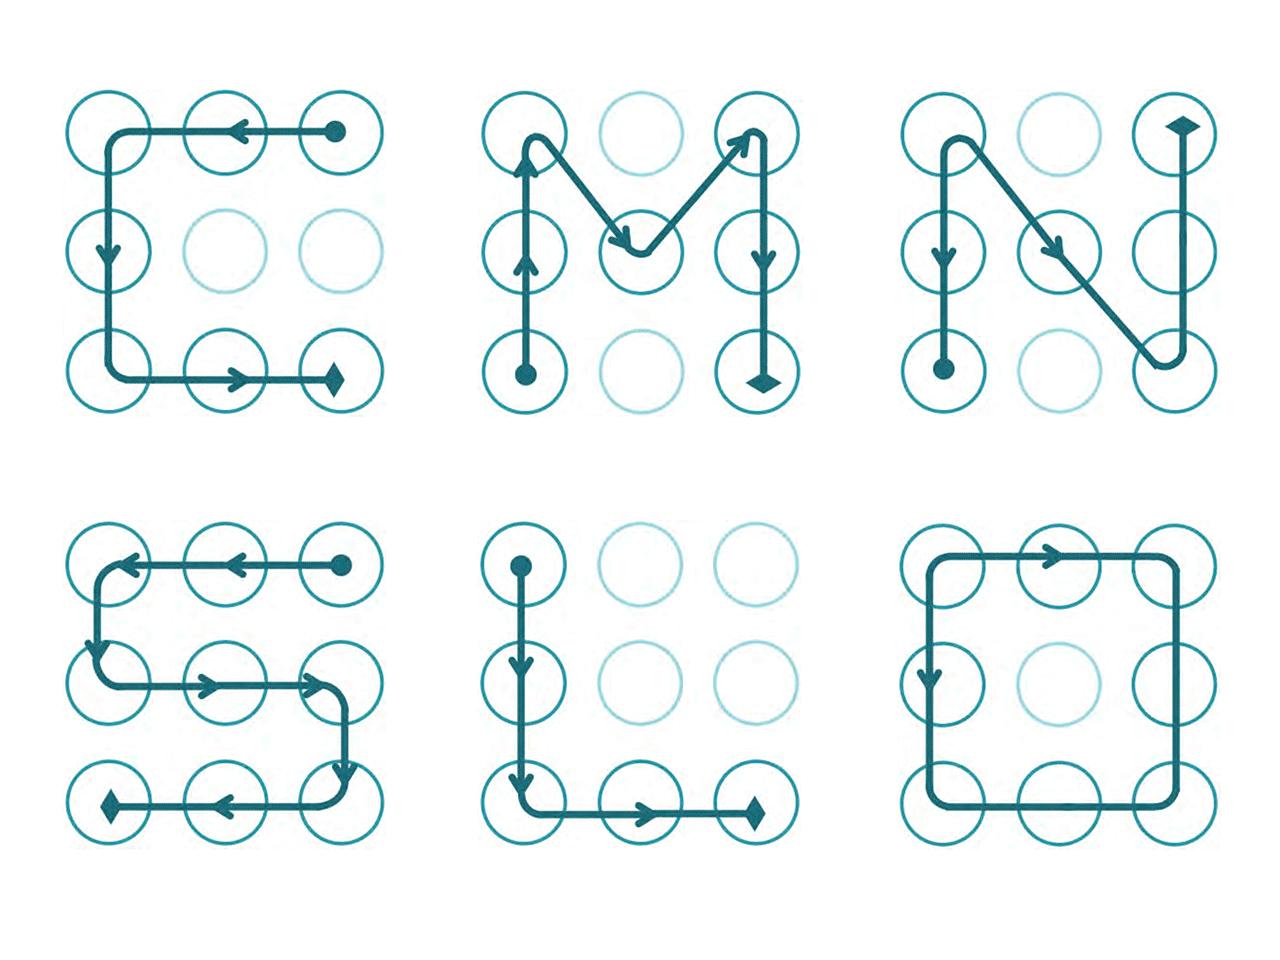 lock-patterns-1